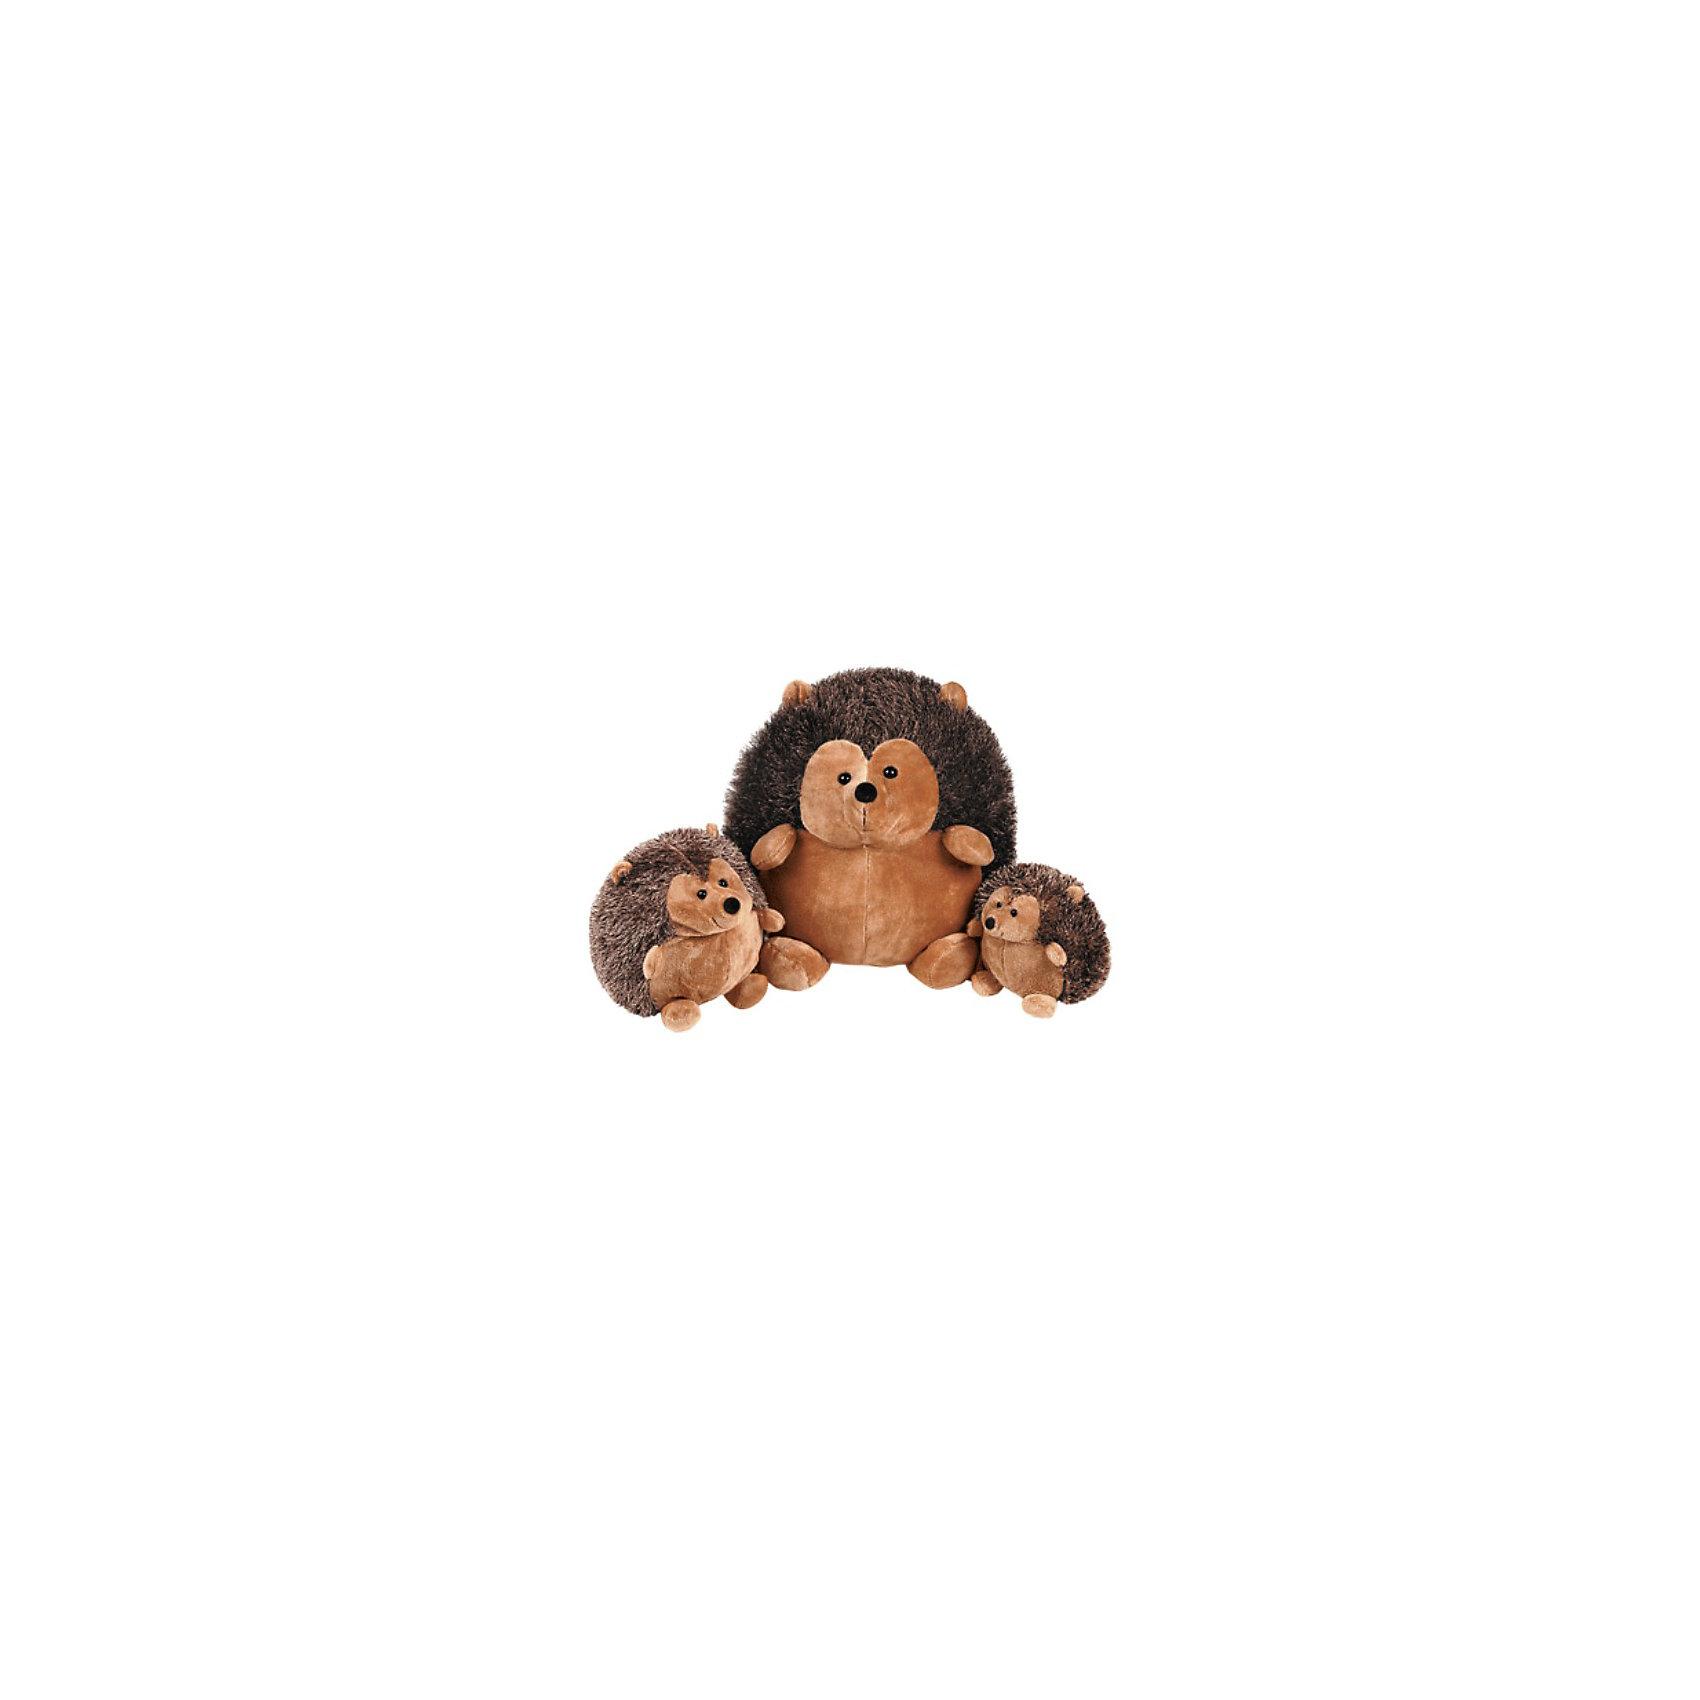 Gulliver Ежик сидячий, 35 см, Gulliver мягкие игрушки gulliver ежик